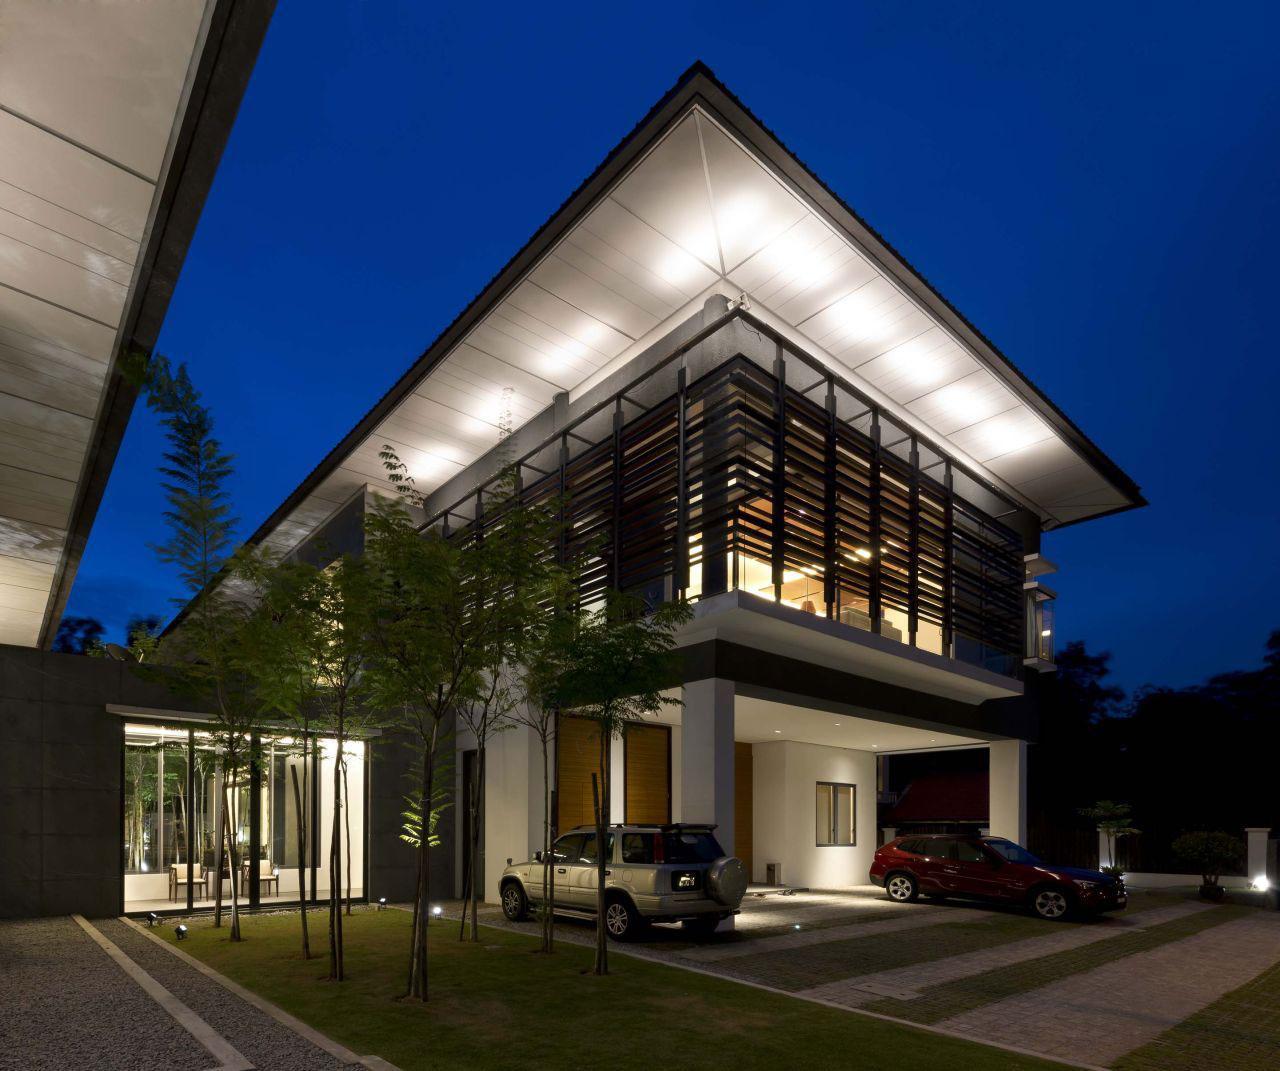 Home Design Ideas Malaysia: Zeta House By 29 Design